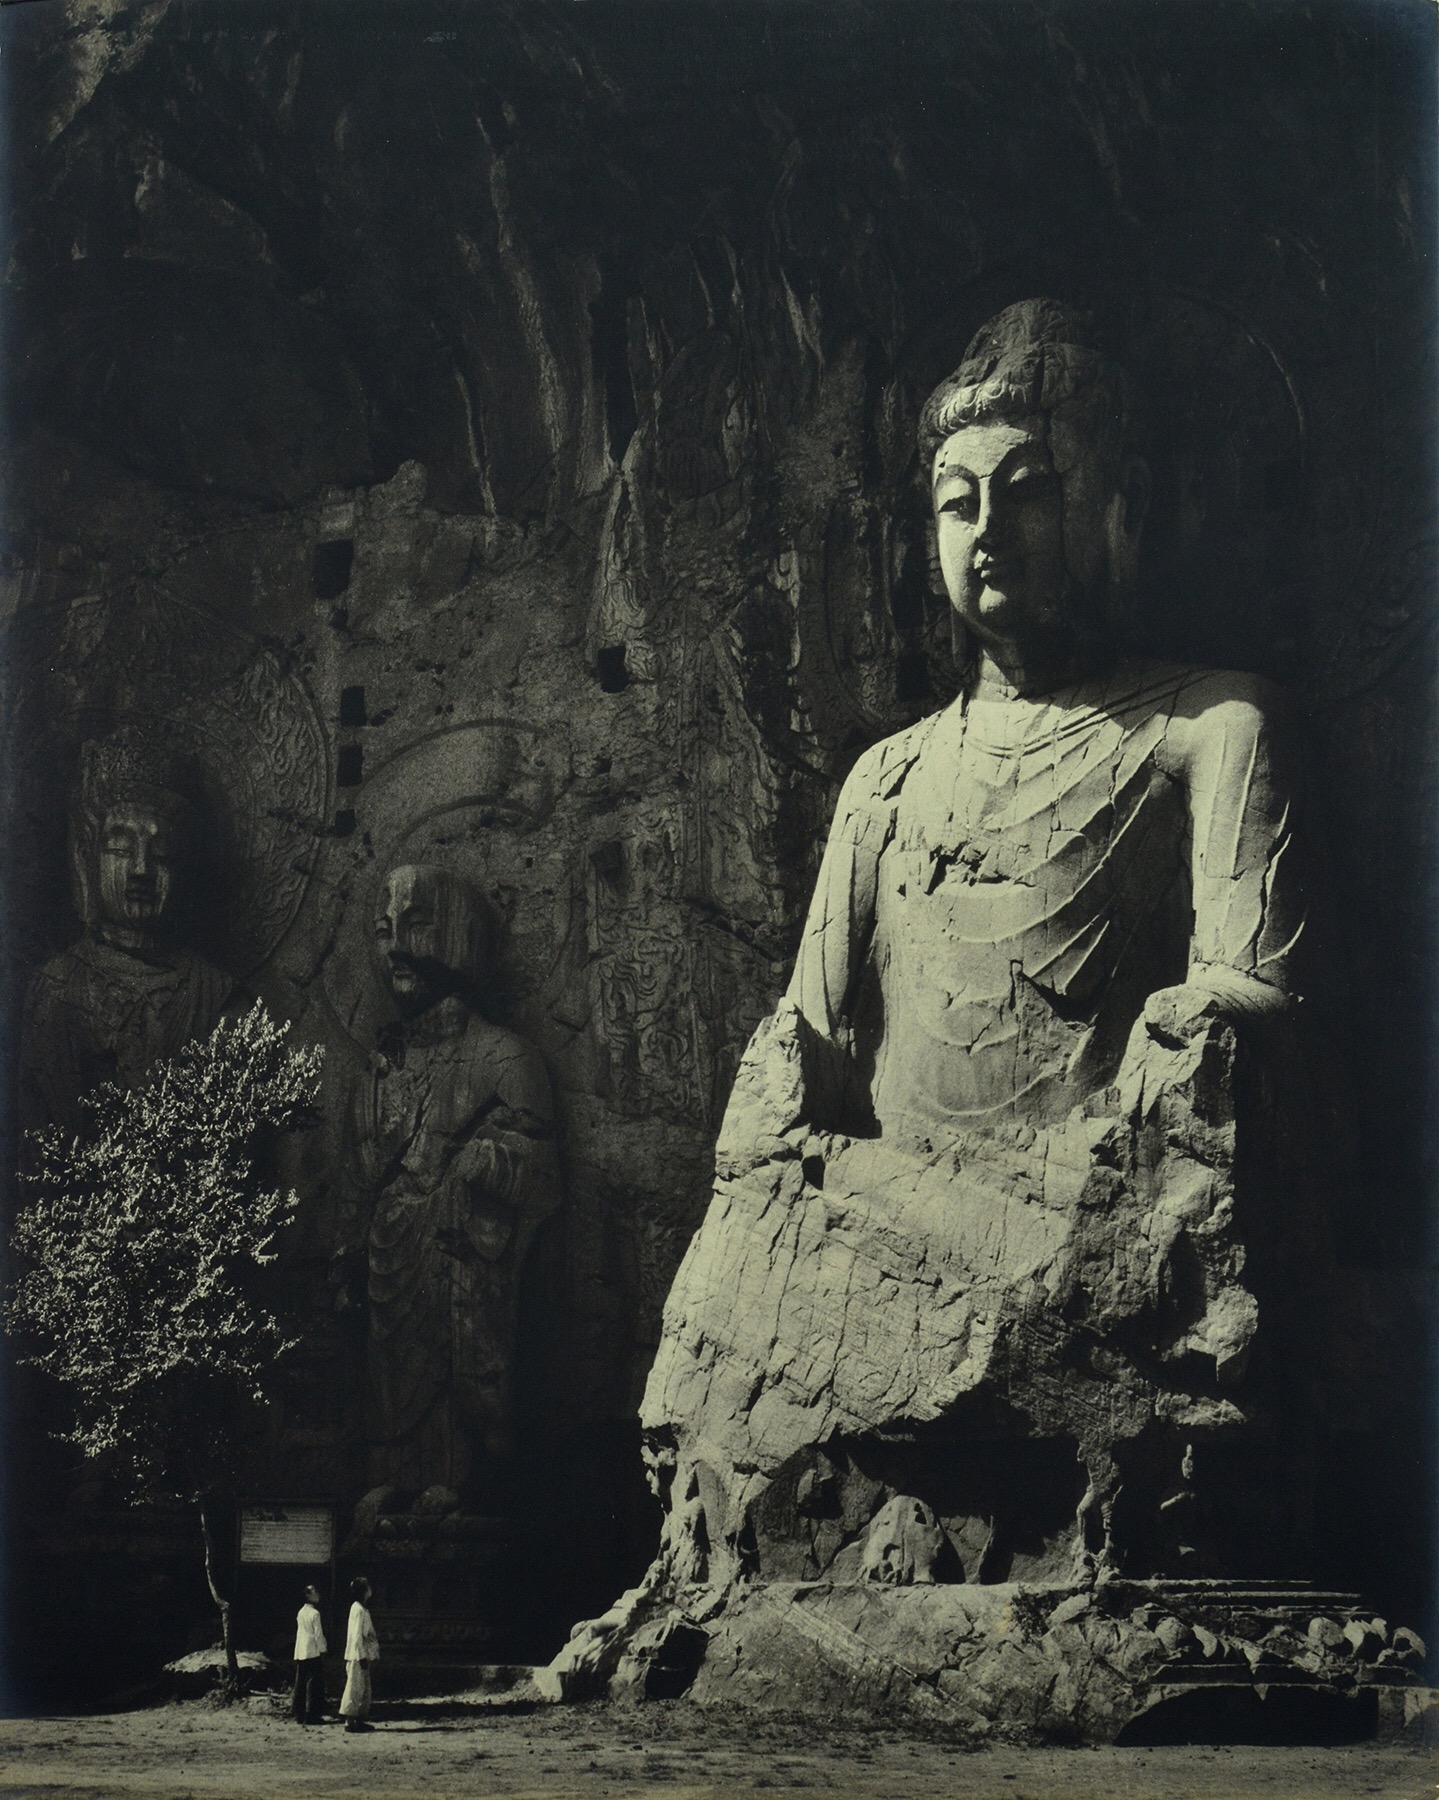 xue-zijiang-china-1950s-photography-of-china-3.jpeg